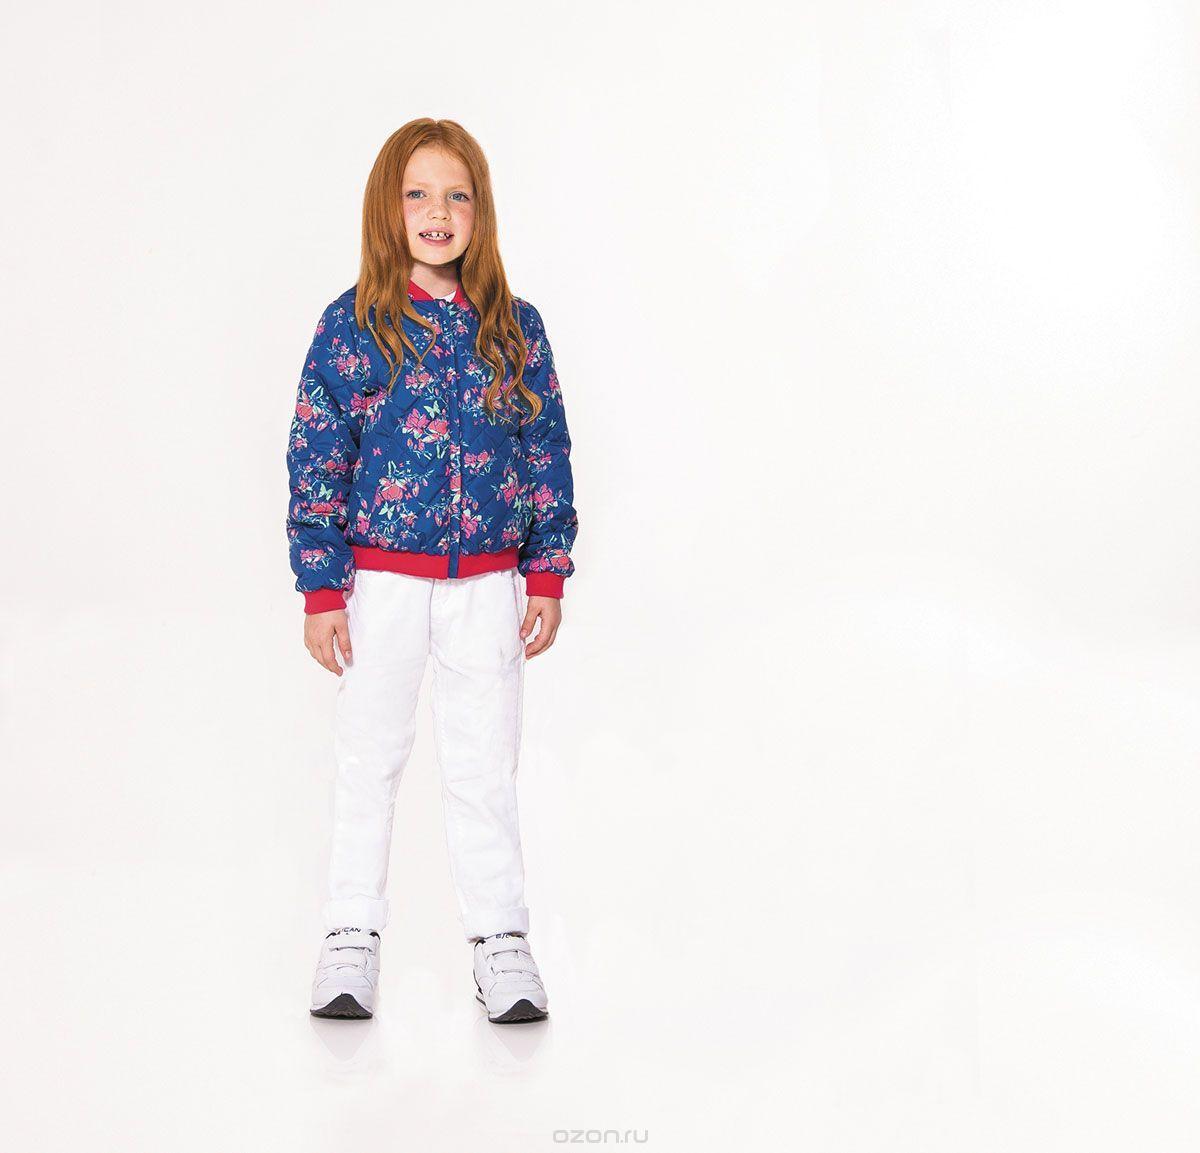 кофта бомбер для девочек фото